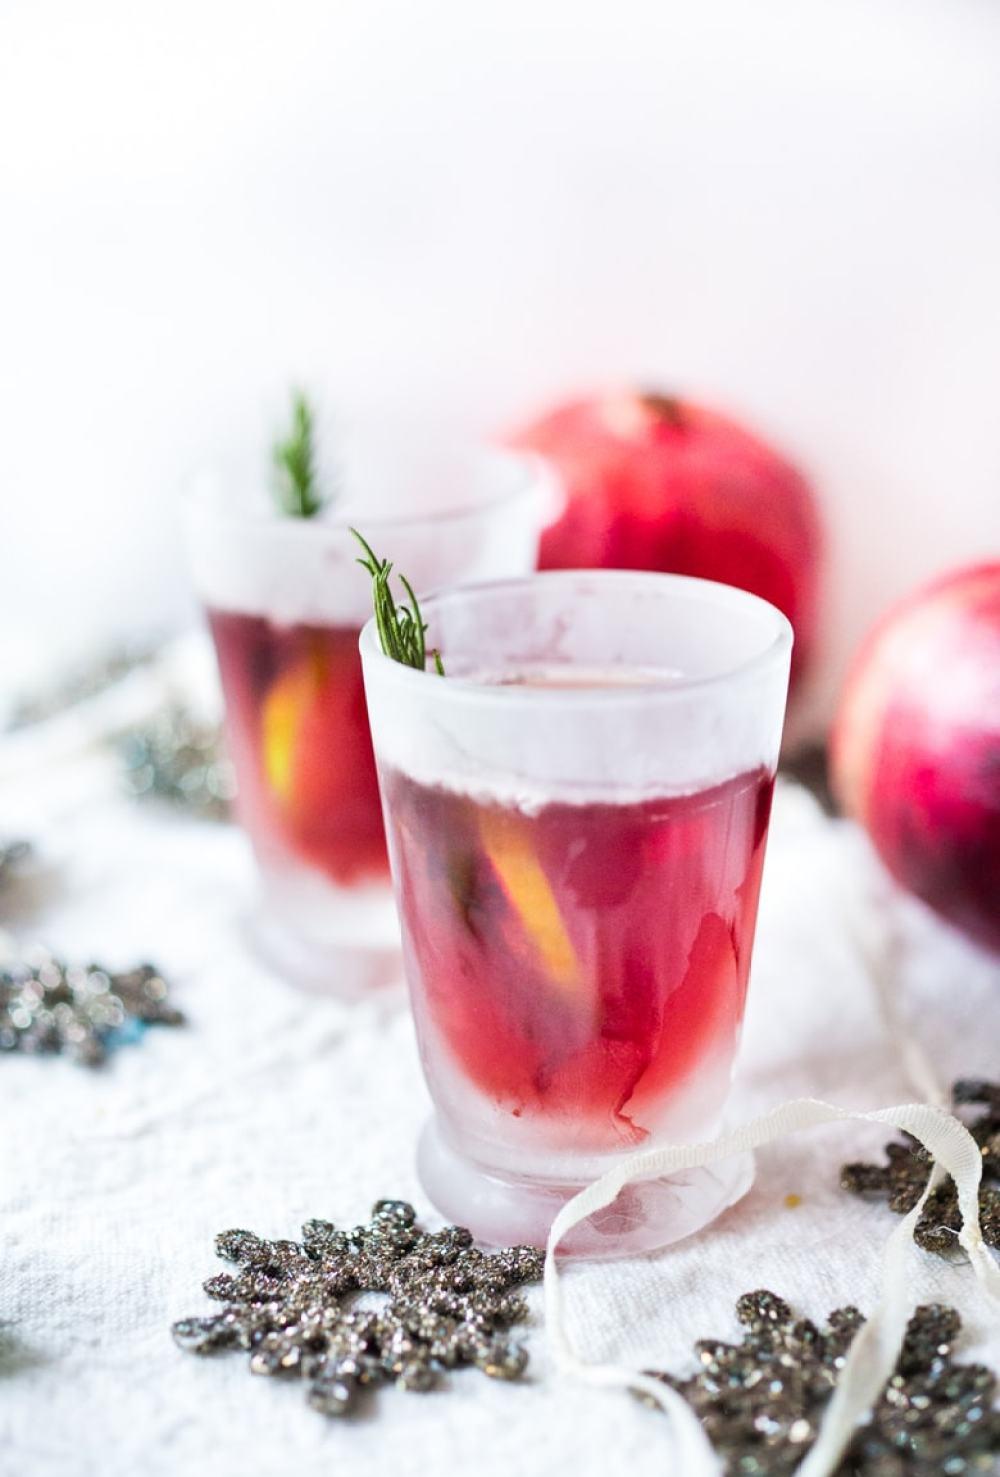 Pomegranate Drop with Rosemary